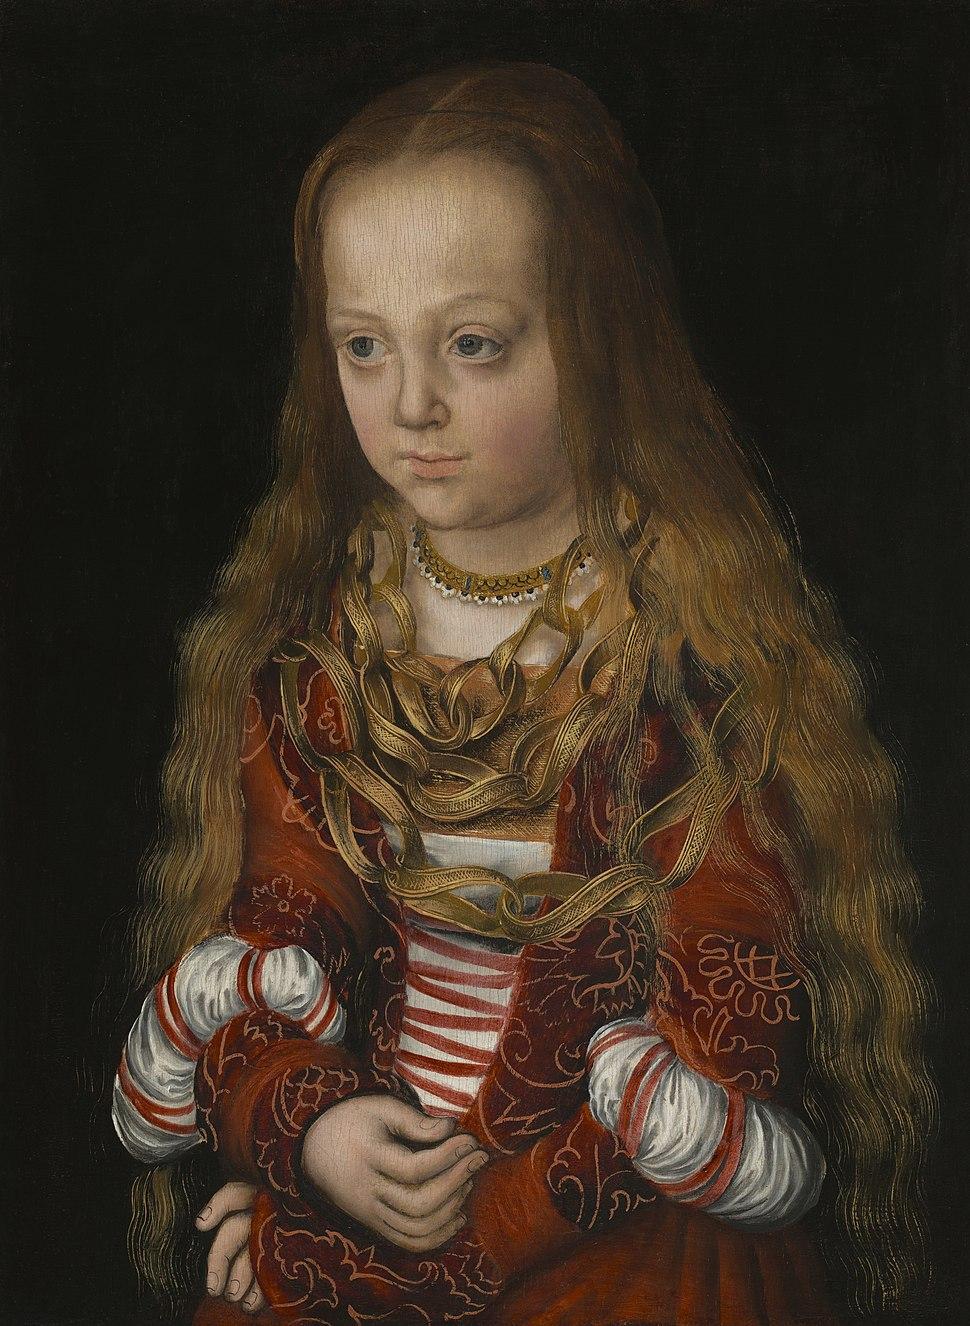 Lucas Cranach d. %C3%84. 052